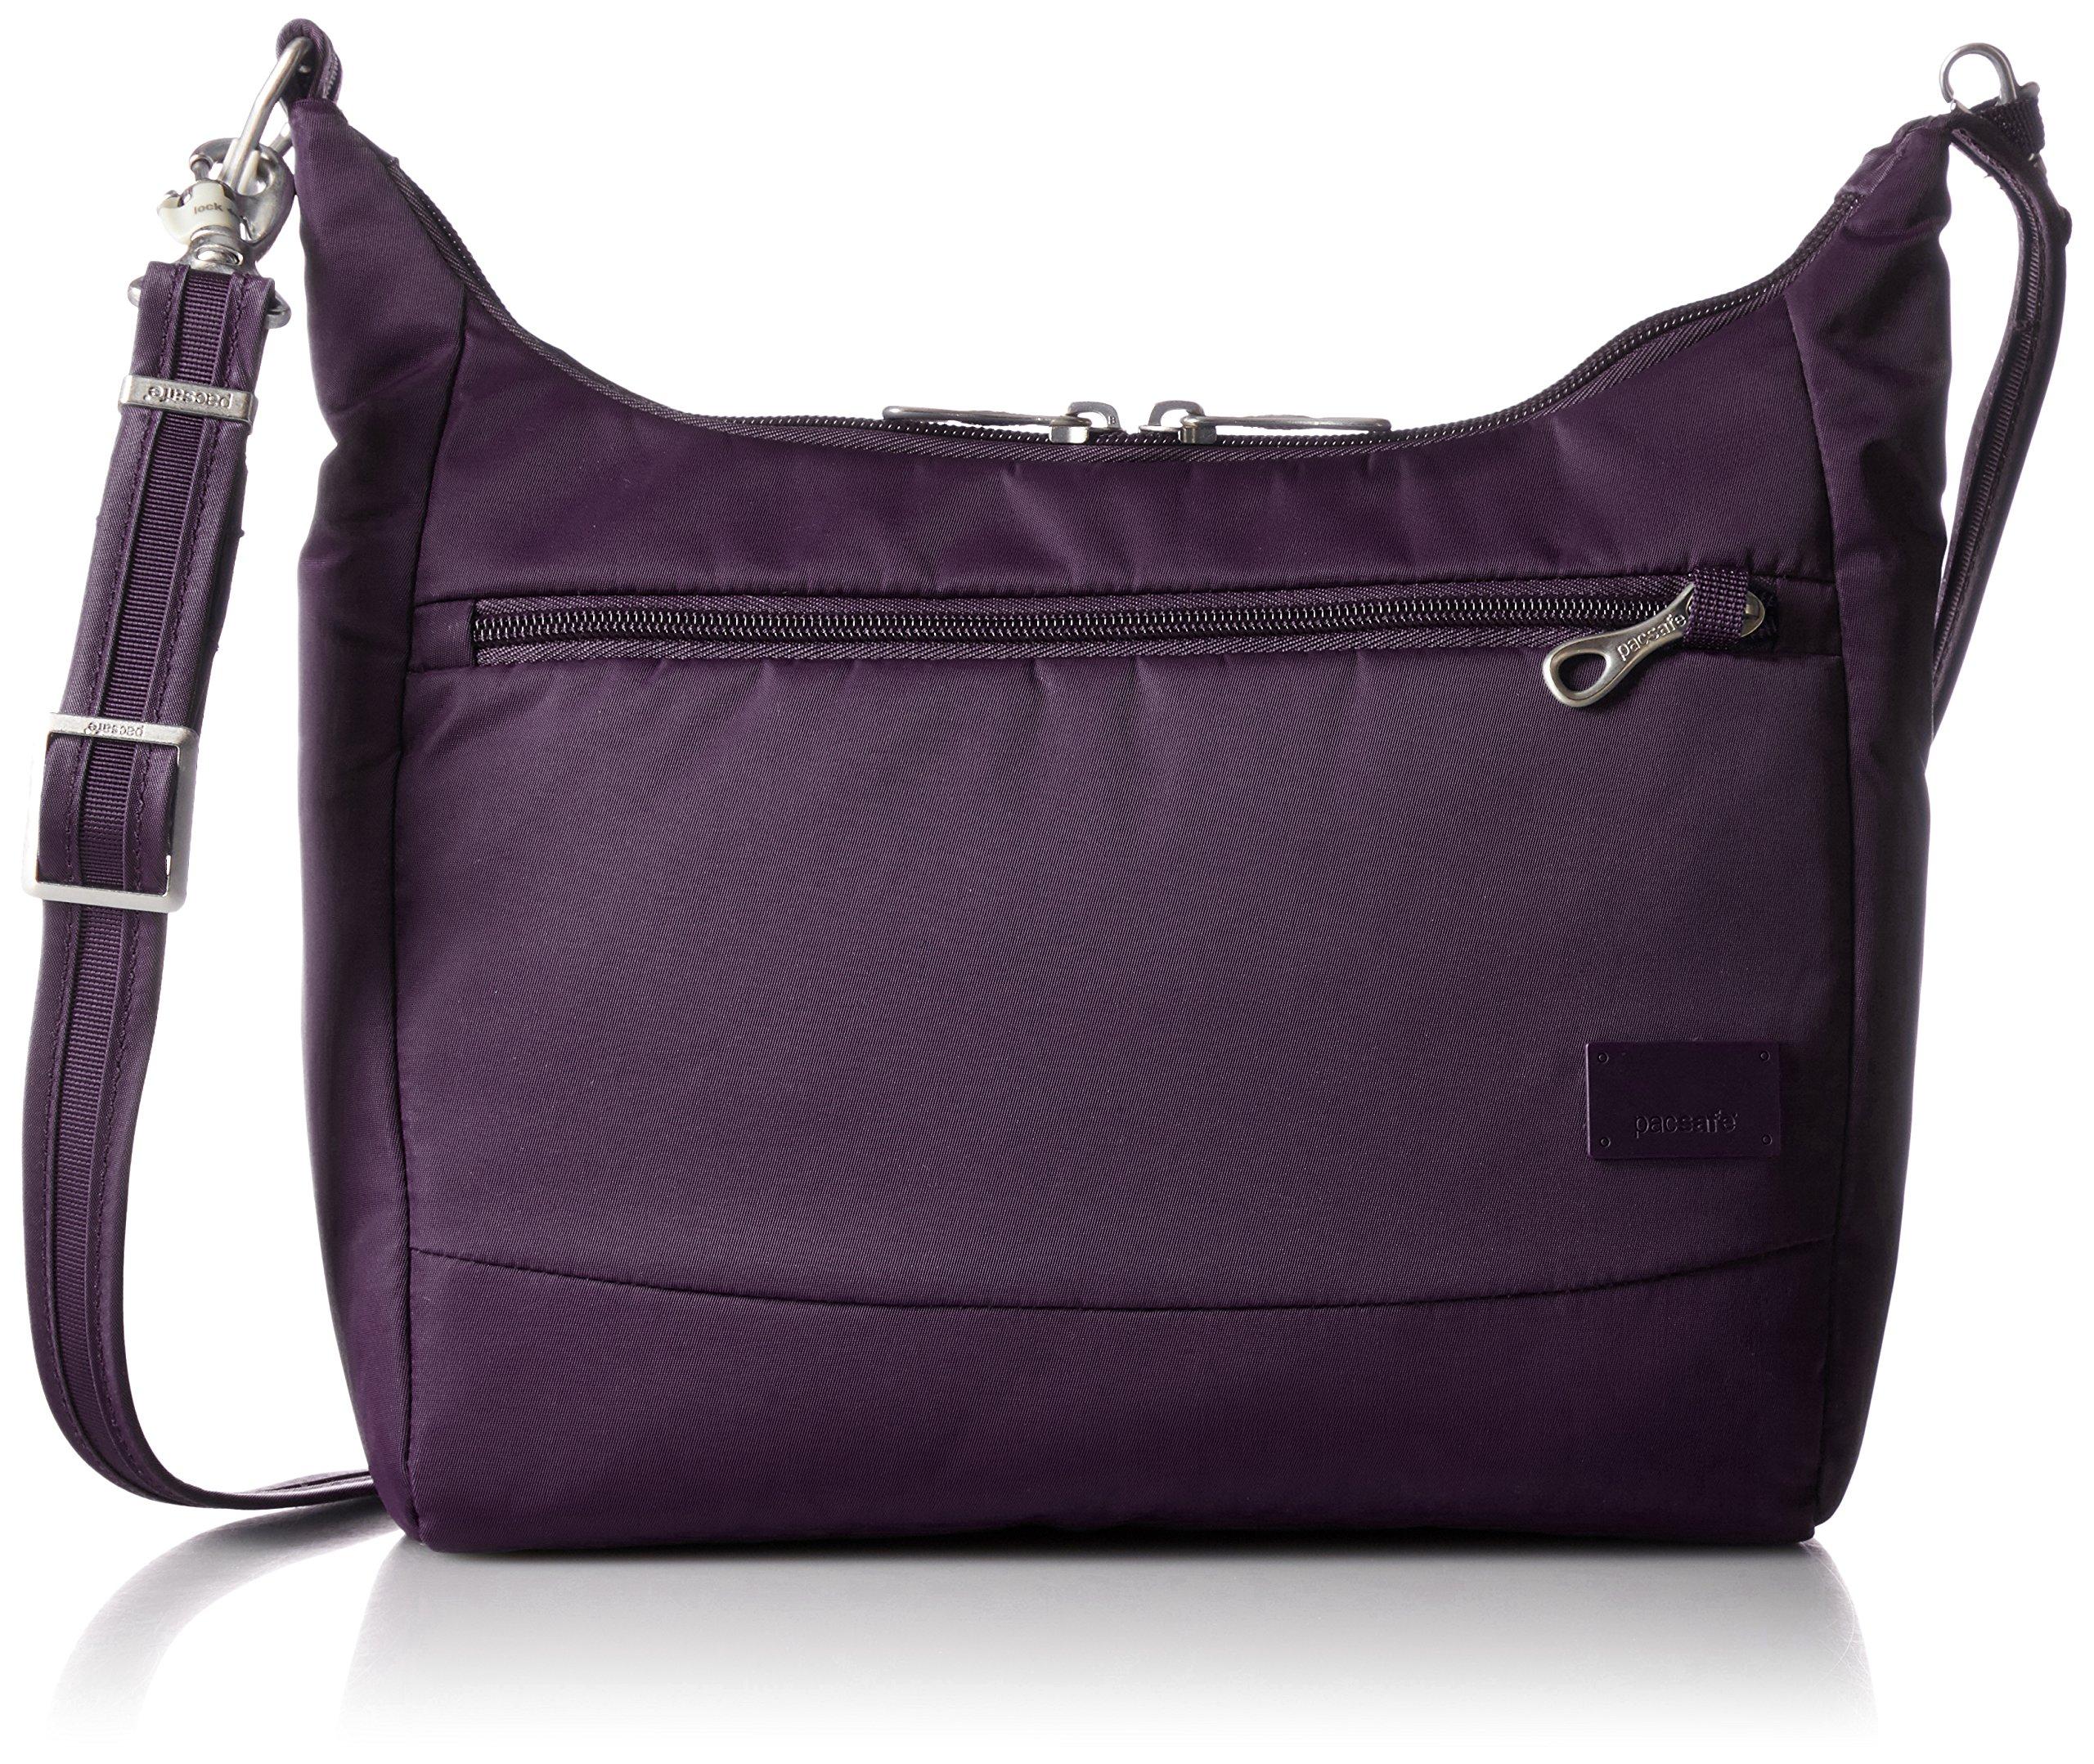 PacSafe Women's Citysafe Cs100 Anti-Theft Handbag Travel Cross-Body Bag, Mulberry, One Size